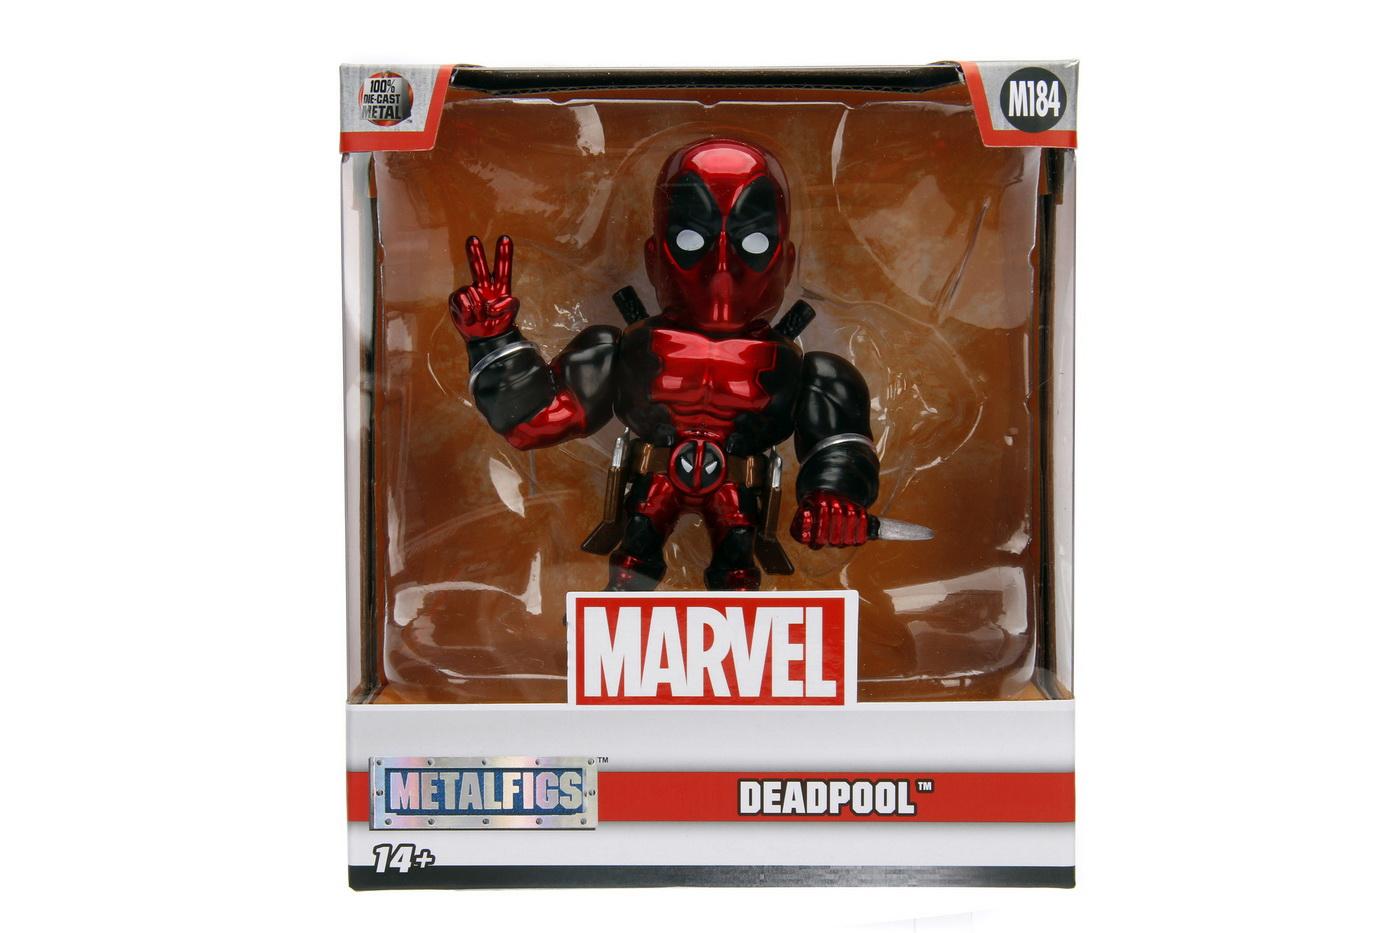 Marvel Figurina Metalica Deadpool 10 Cm